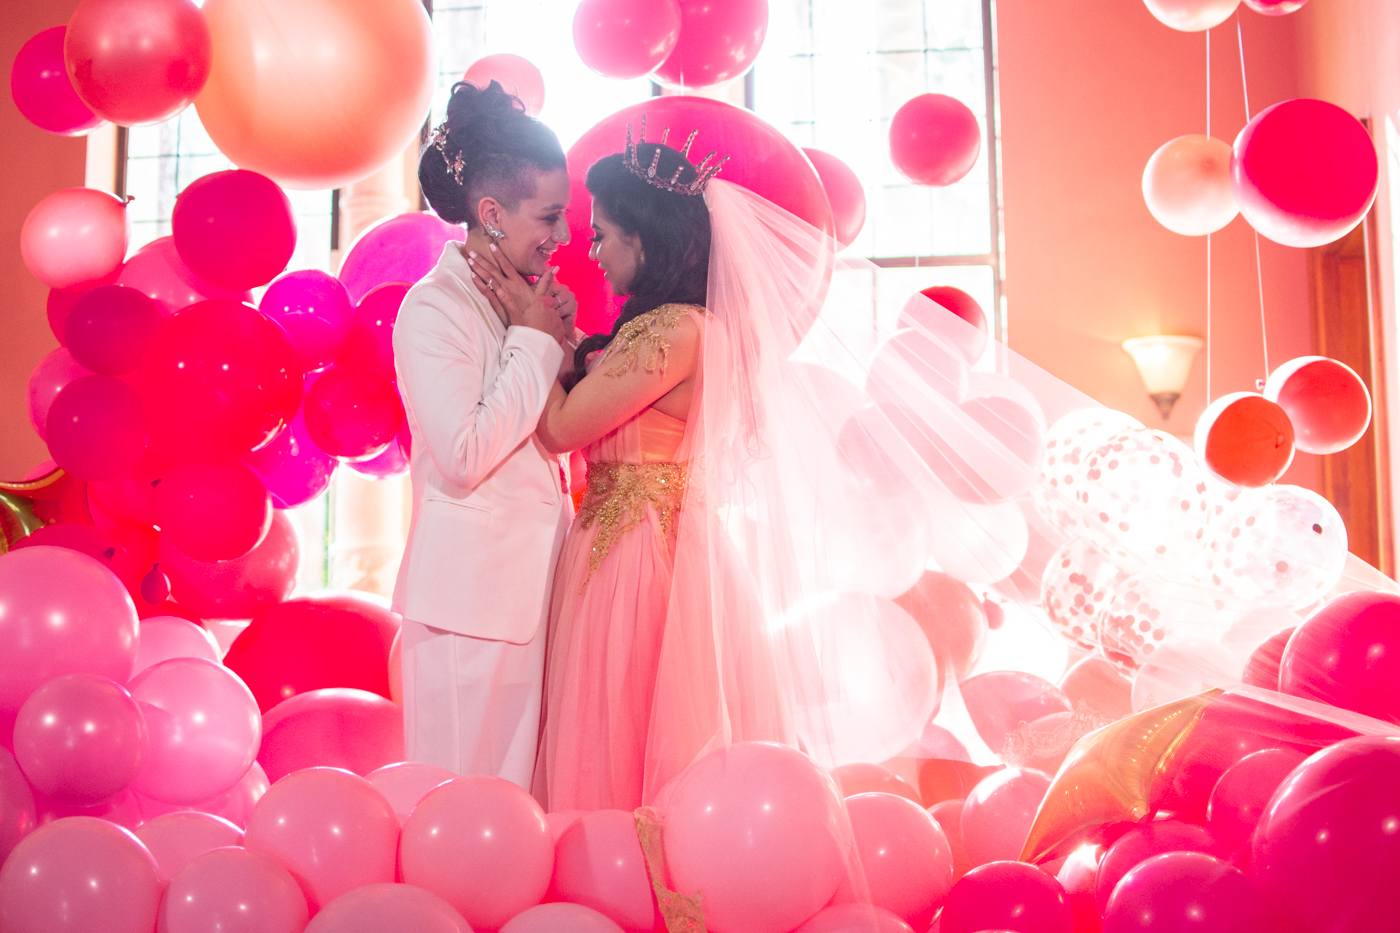 Glitzy-pink-glinda-the-good-witch-wedding-inspiration-jade-elora-equally-wed-11.jpg.jpg